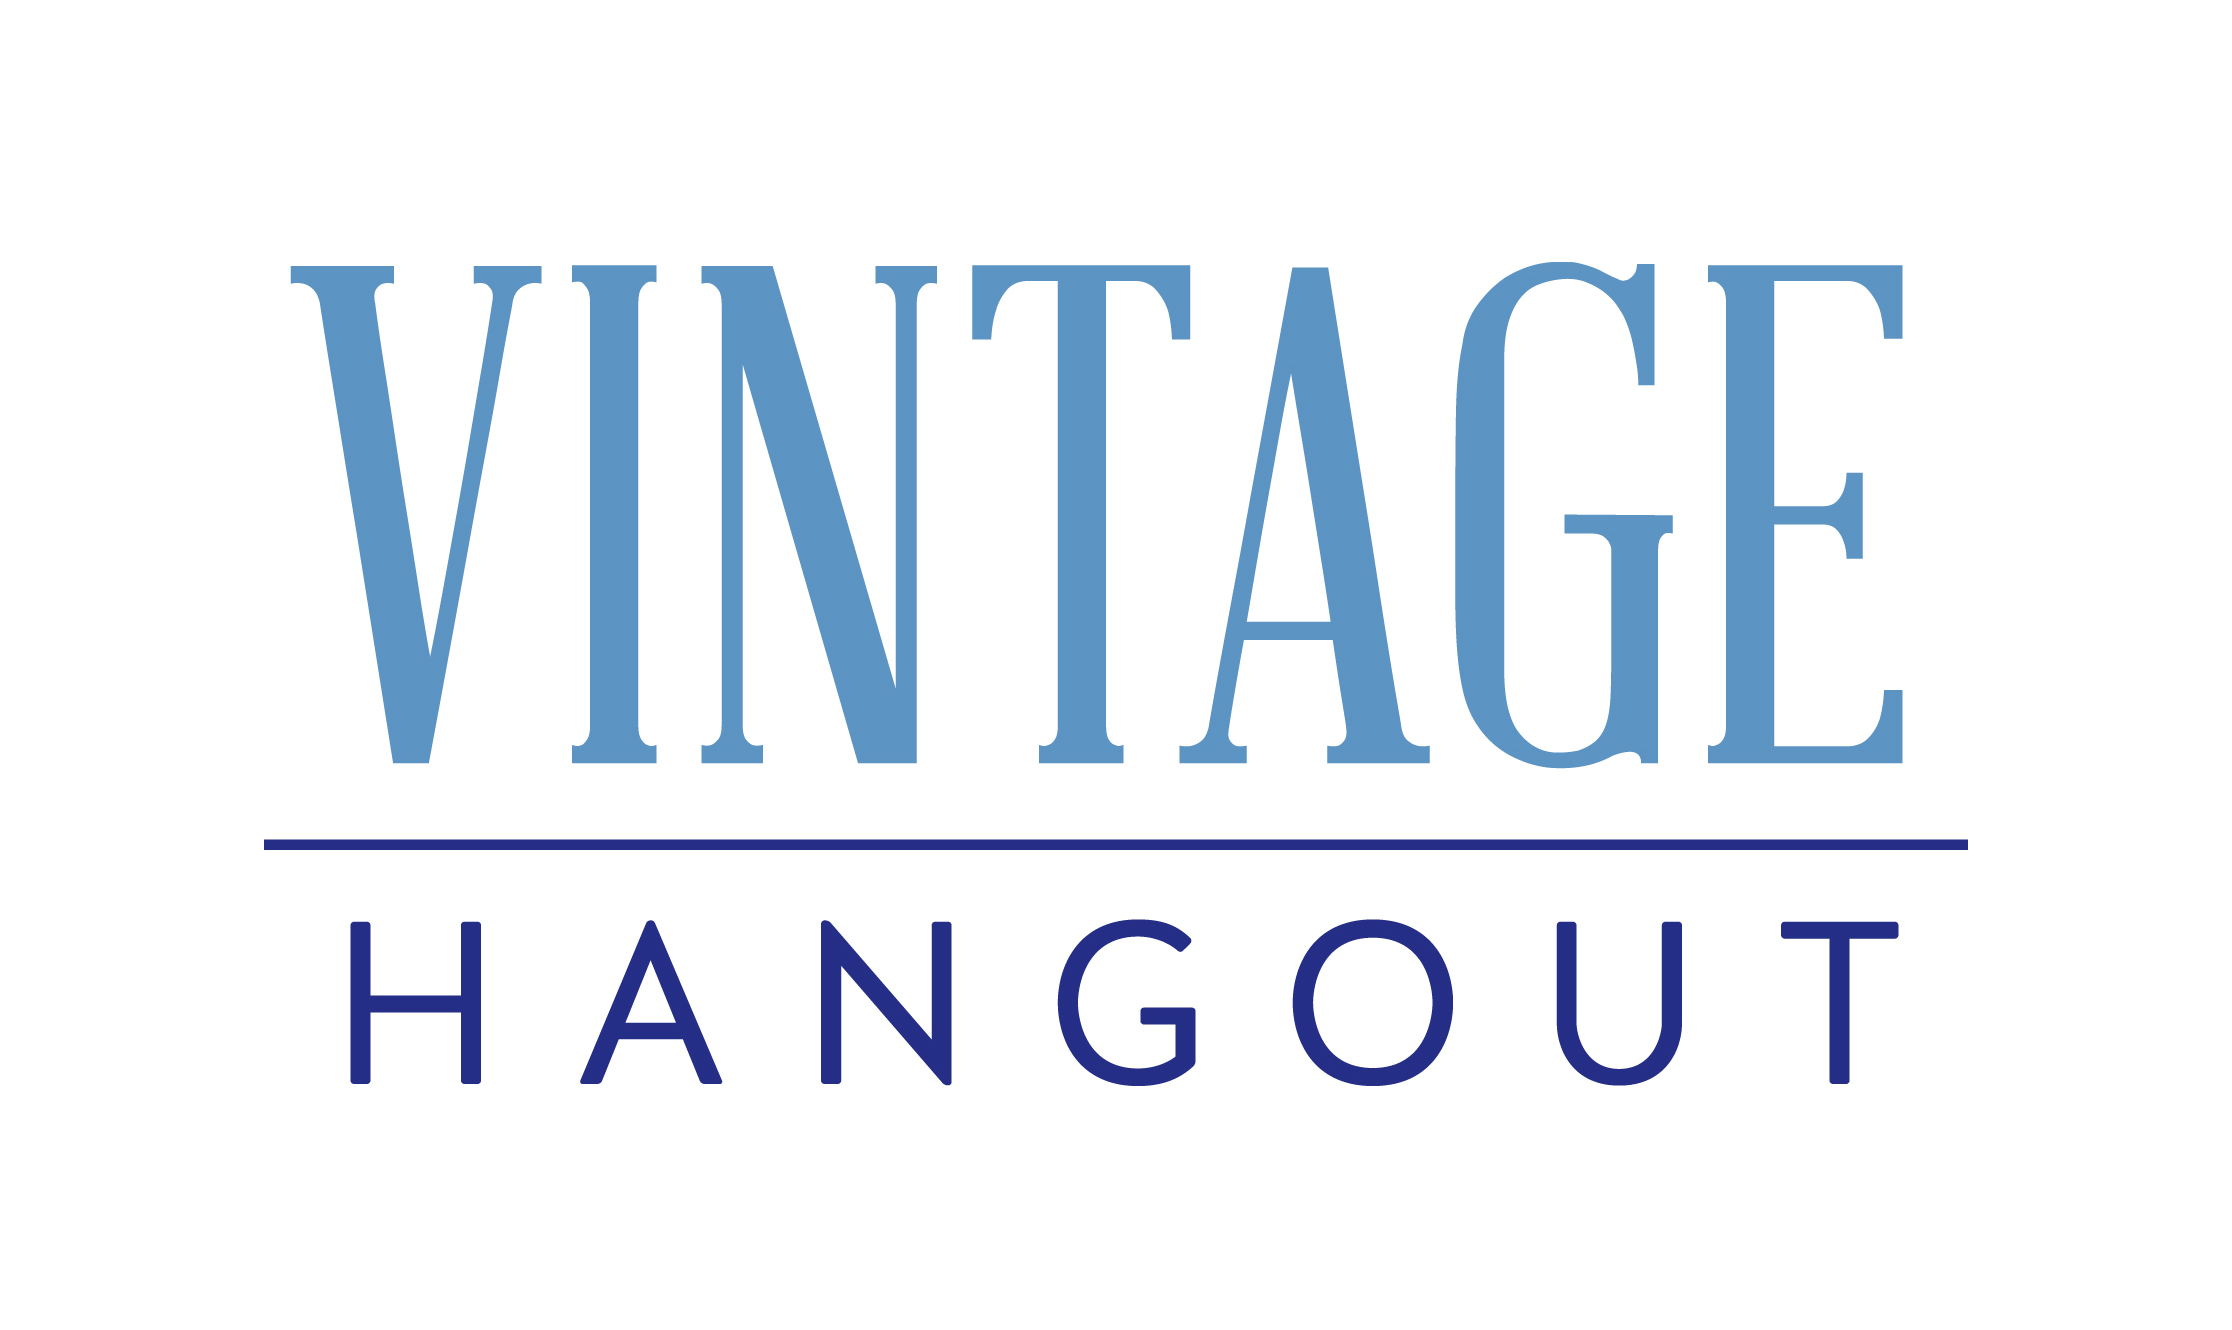 VintageHangout_Logo-2.jpg